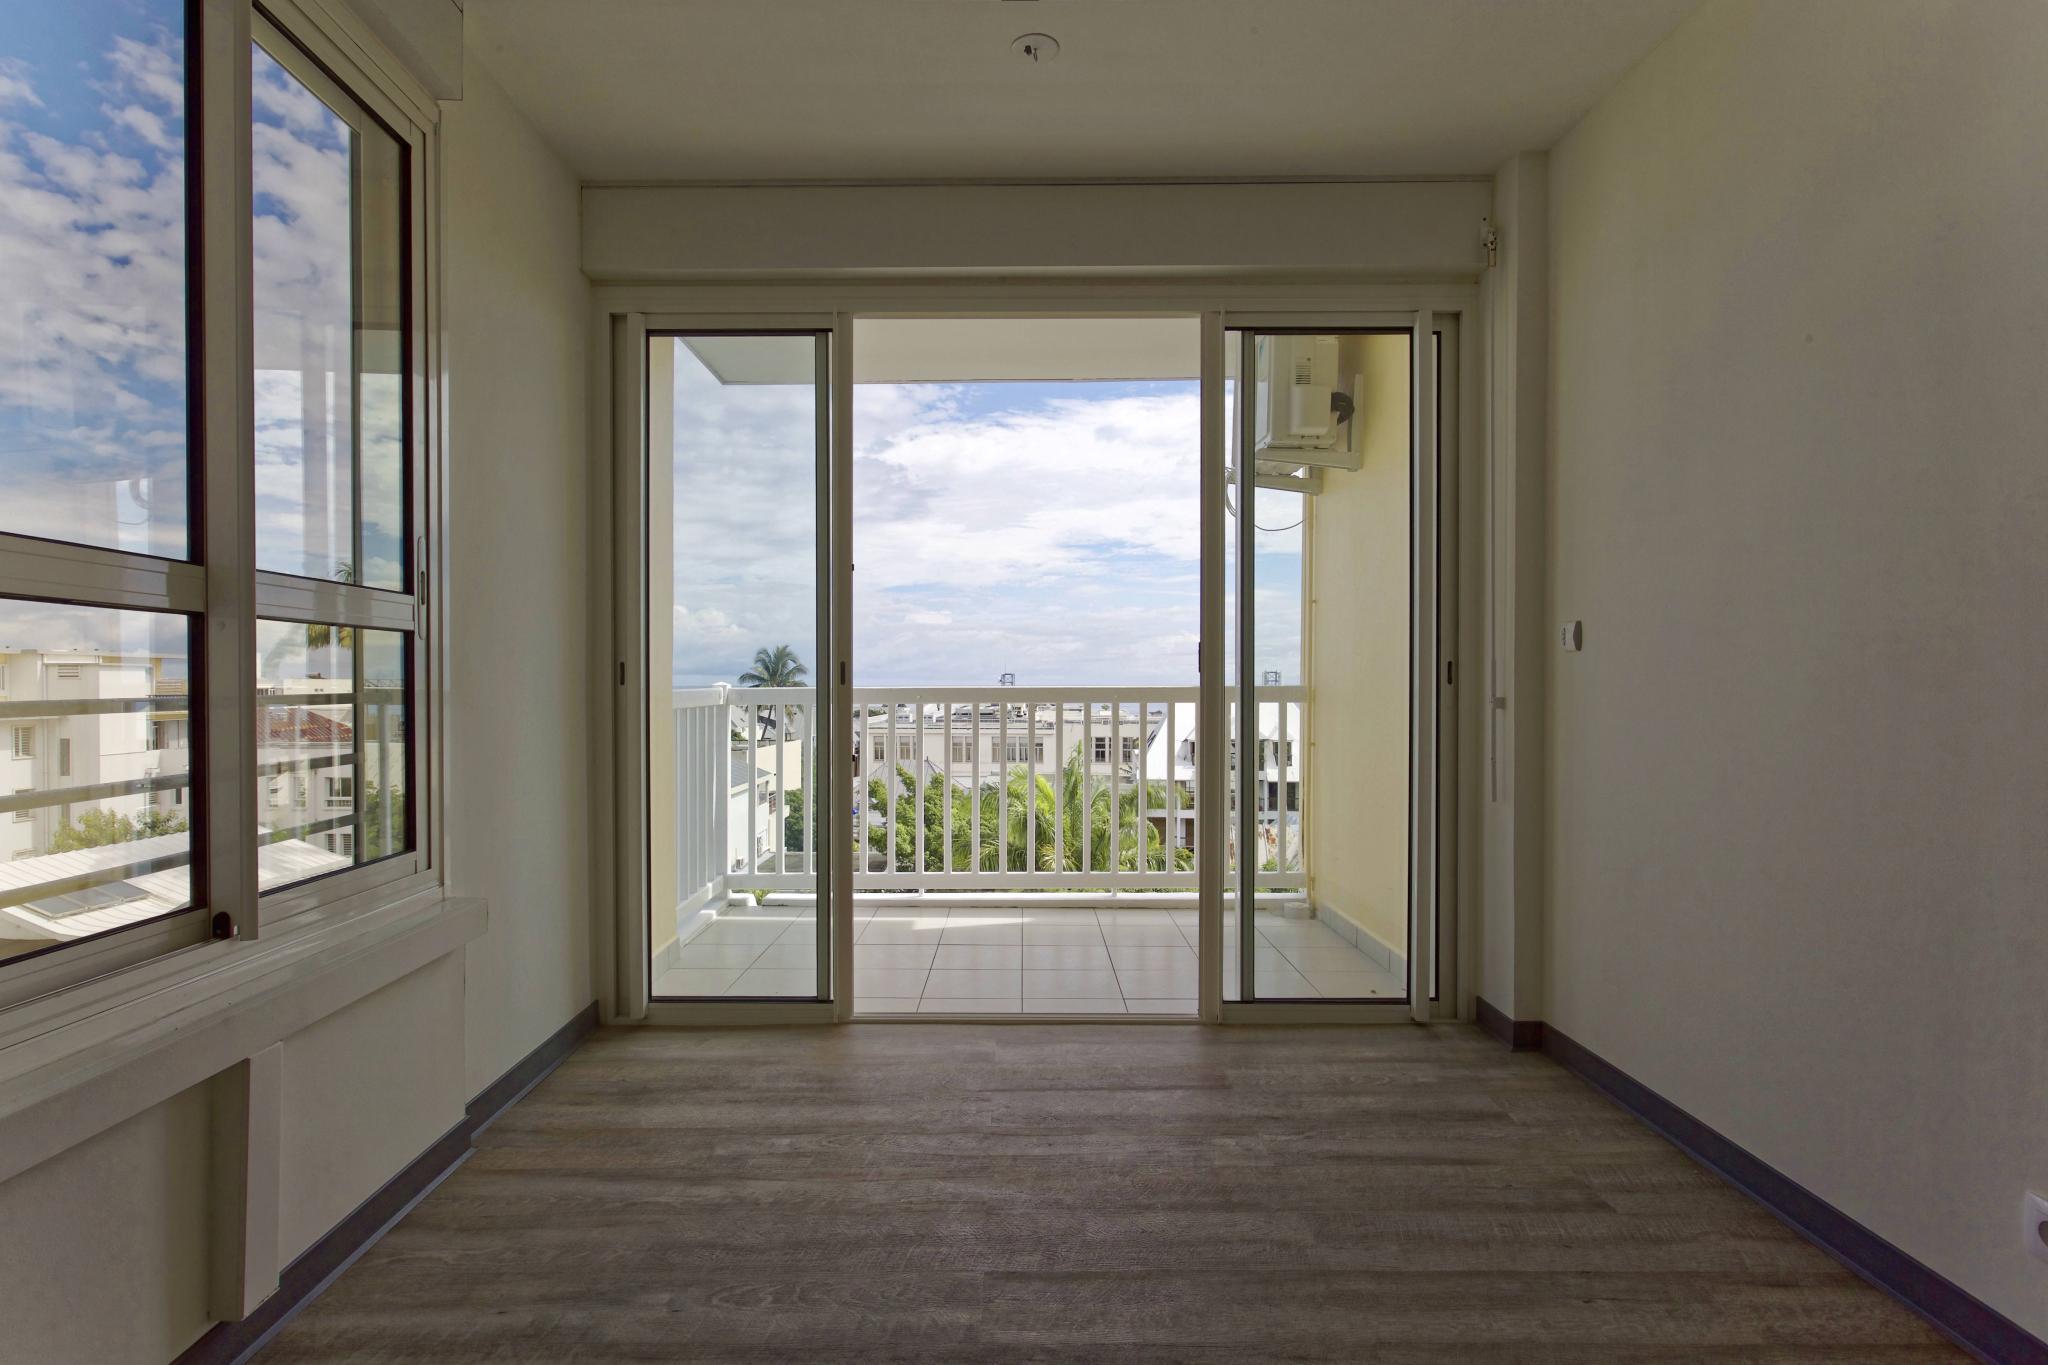 achat appartement saint denis 97400 r union nord r f 104481 468. Black Bedroom Furniture Sets. Home Design Ideas